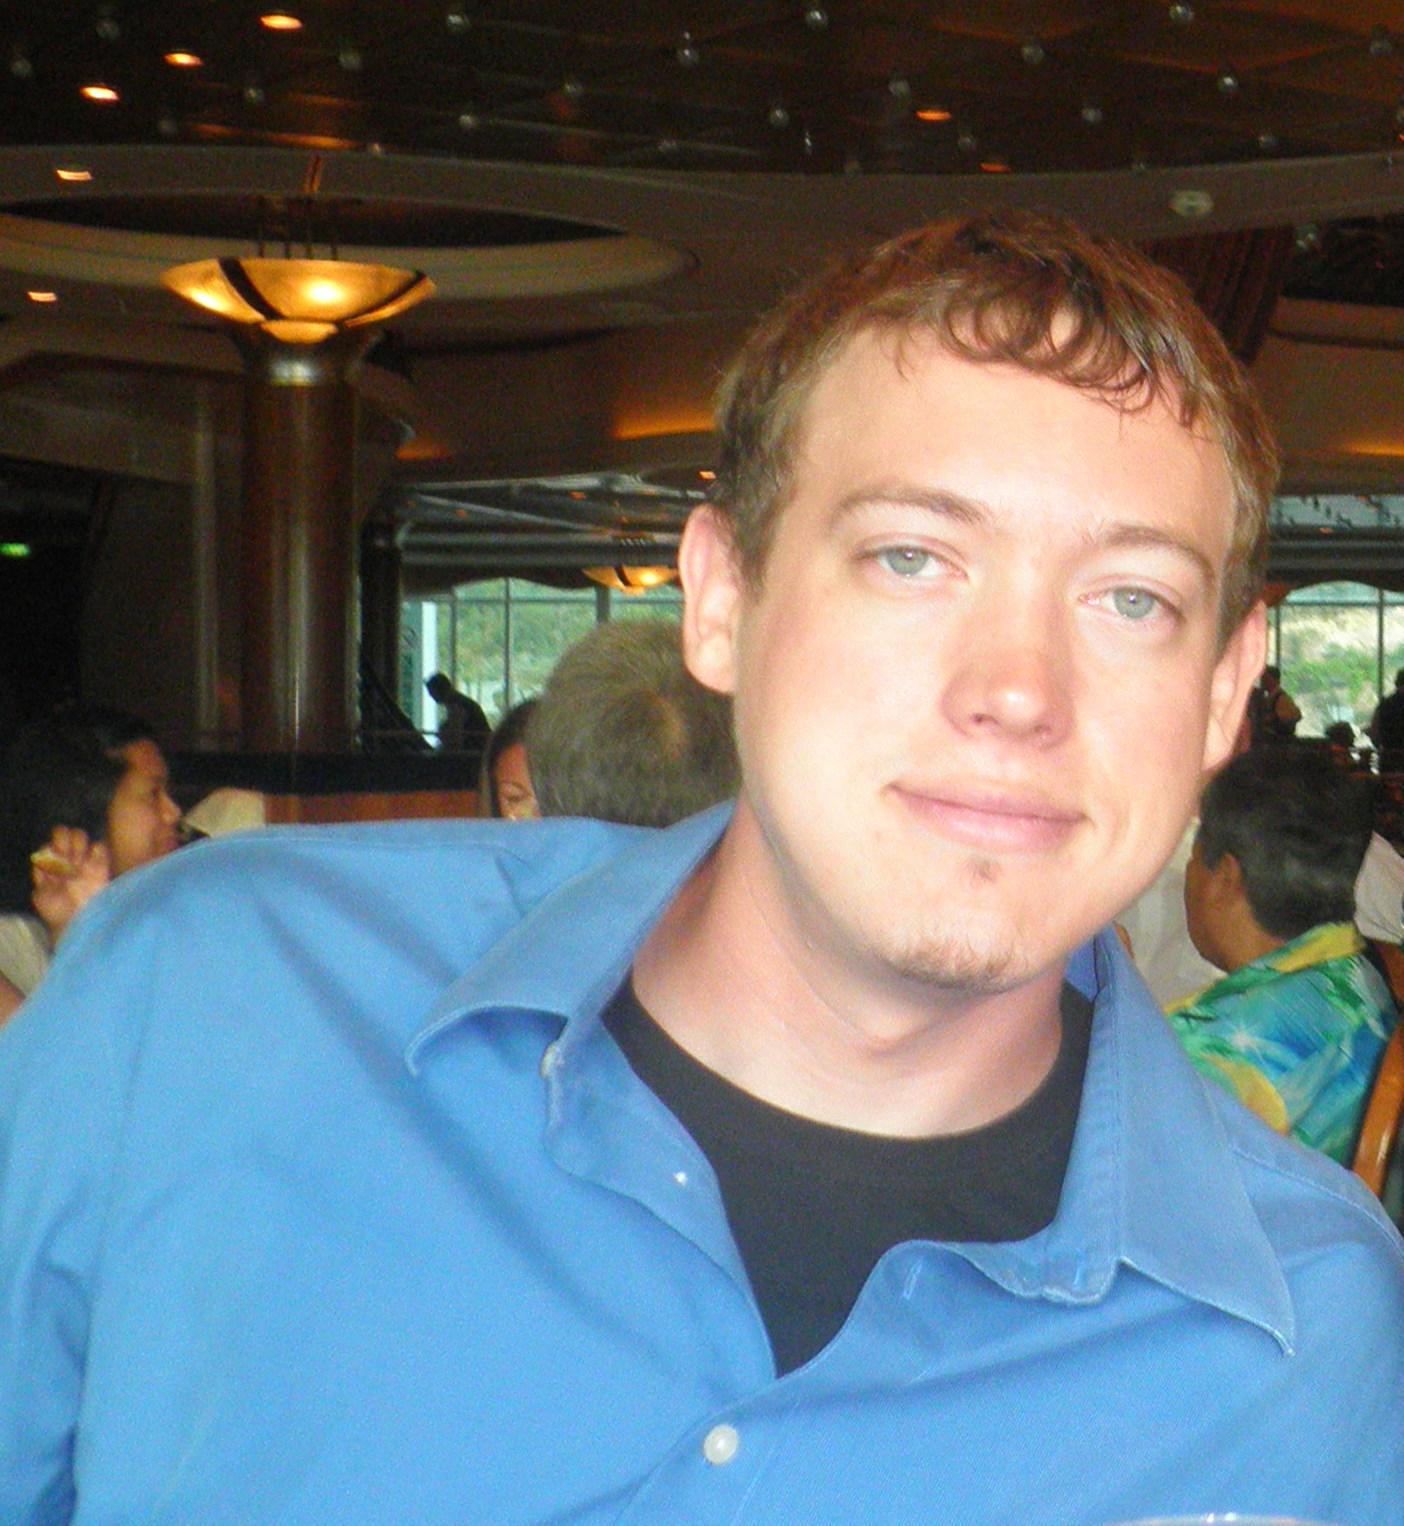 Q Amp A With Brandon Ballantyne From Aspiring Tornado Chaser